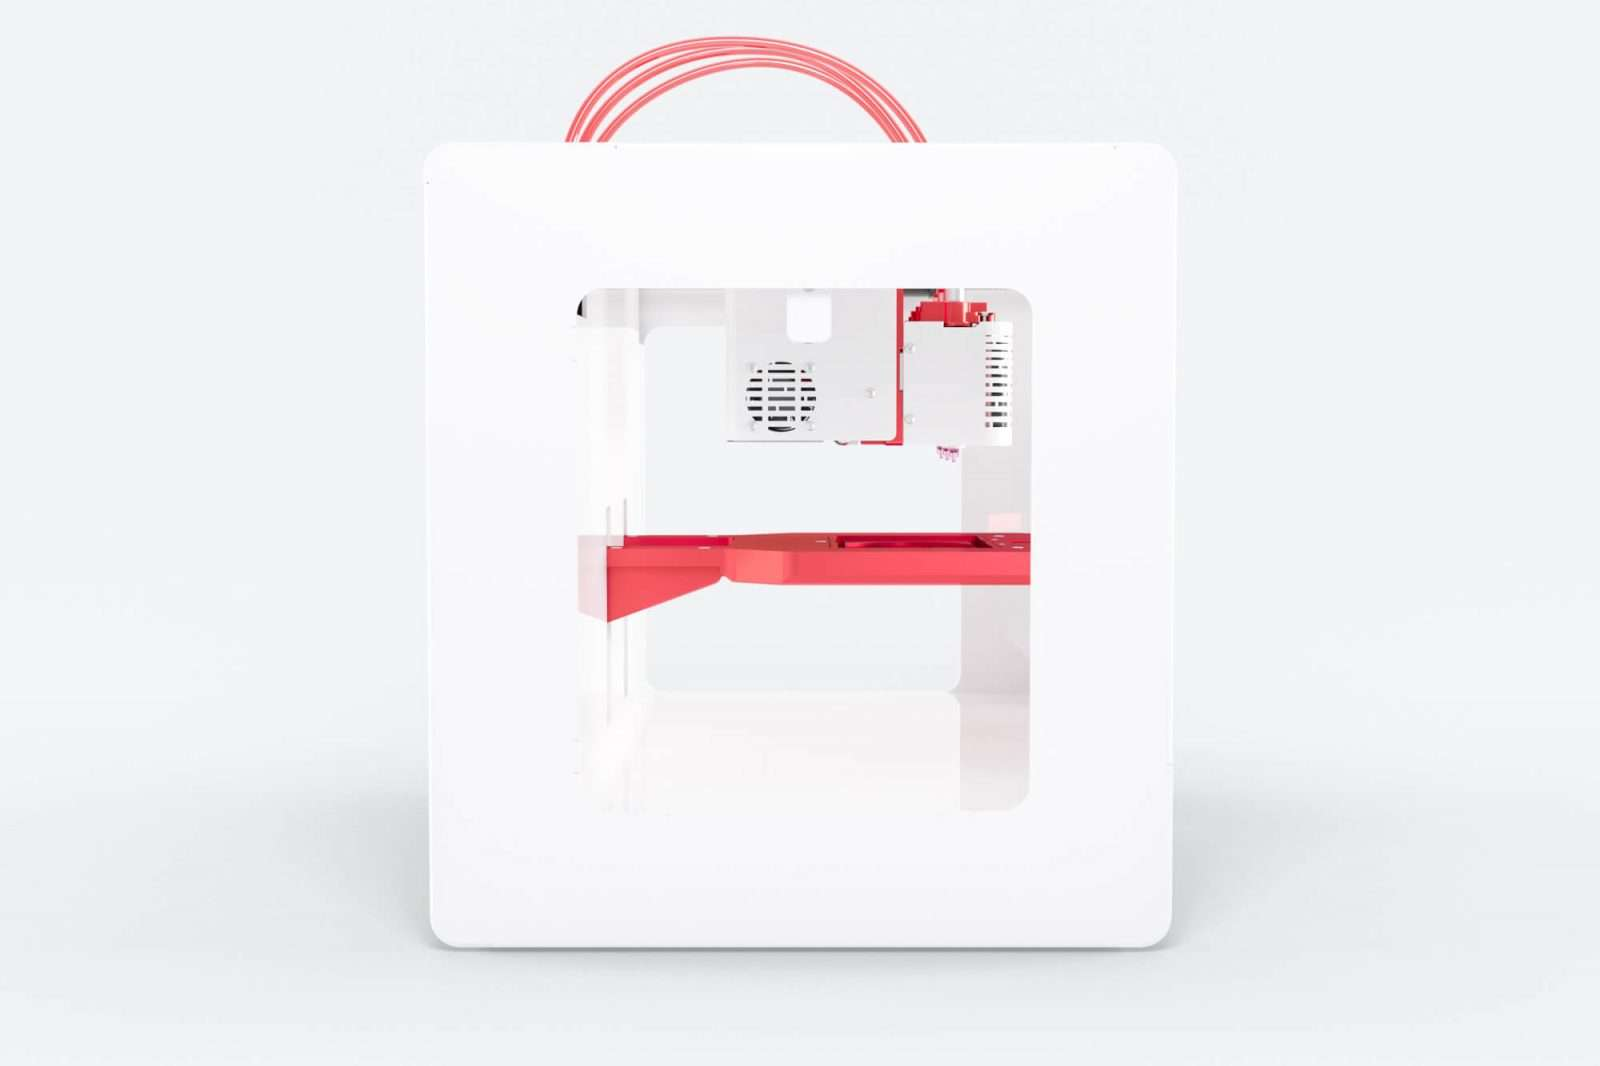 Allevi 3 Bioprinter